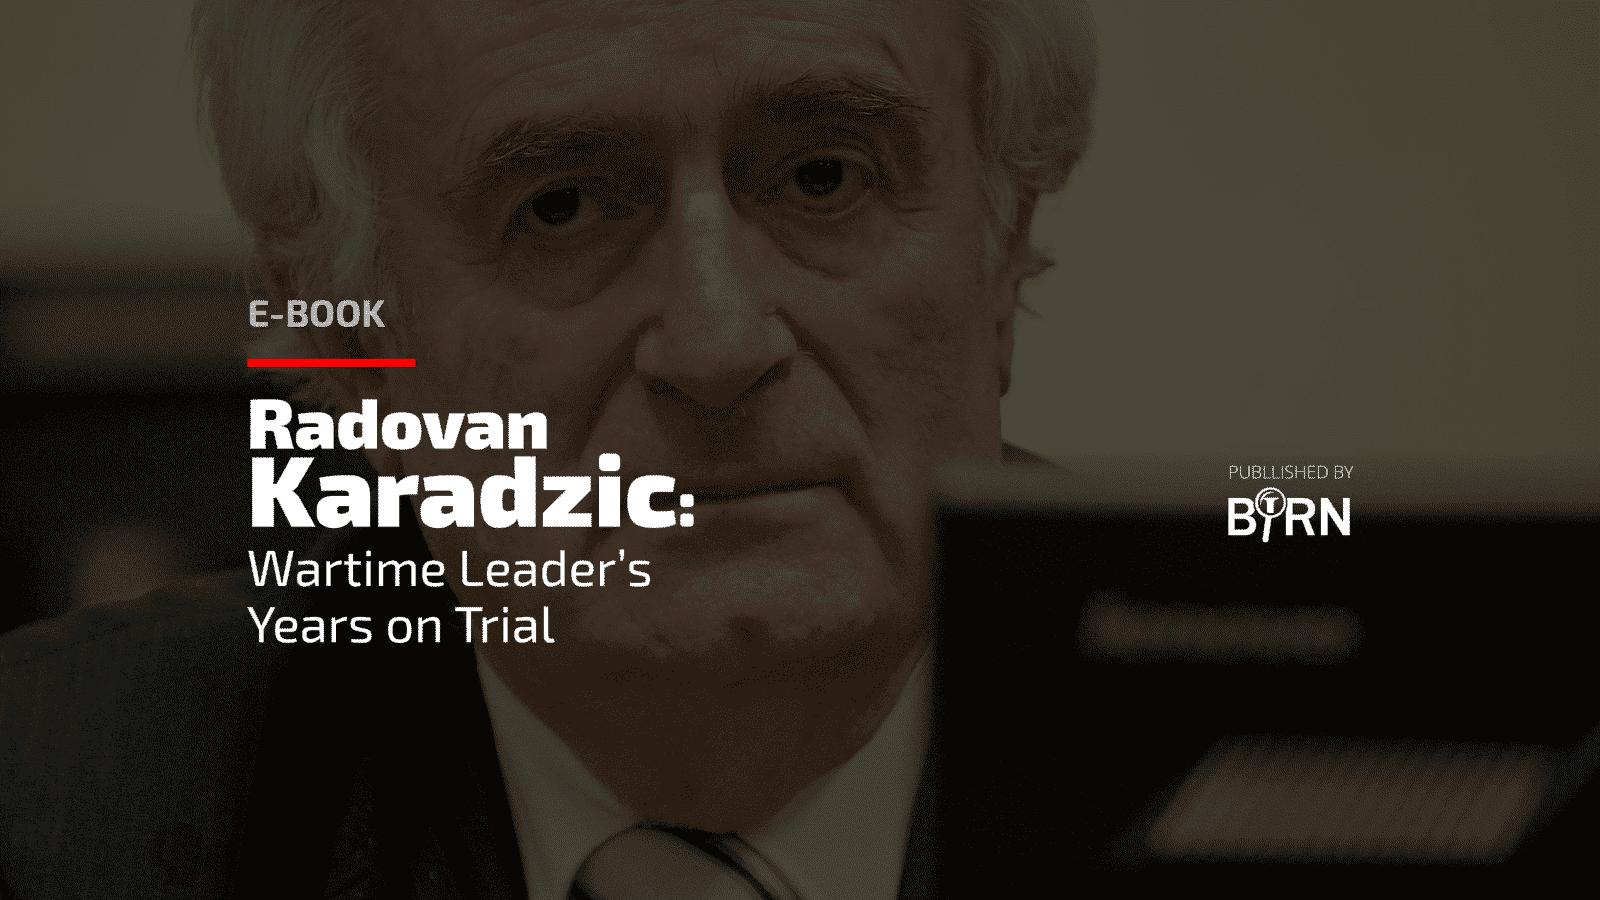 BIRN Publishes Radovan Karadzic Trial E-Book